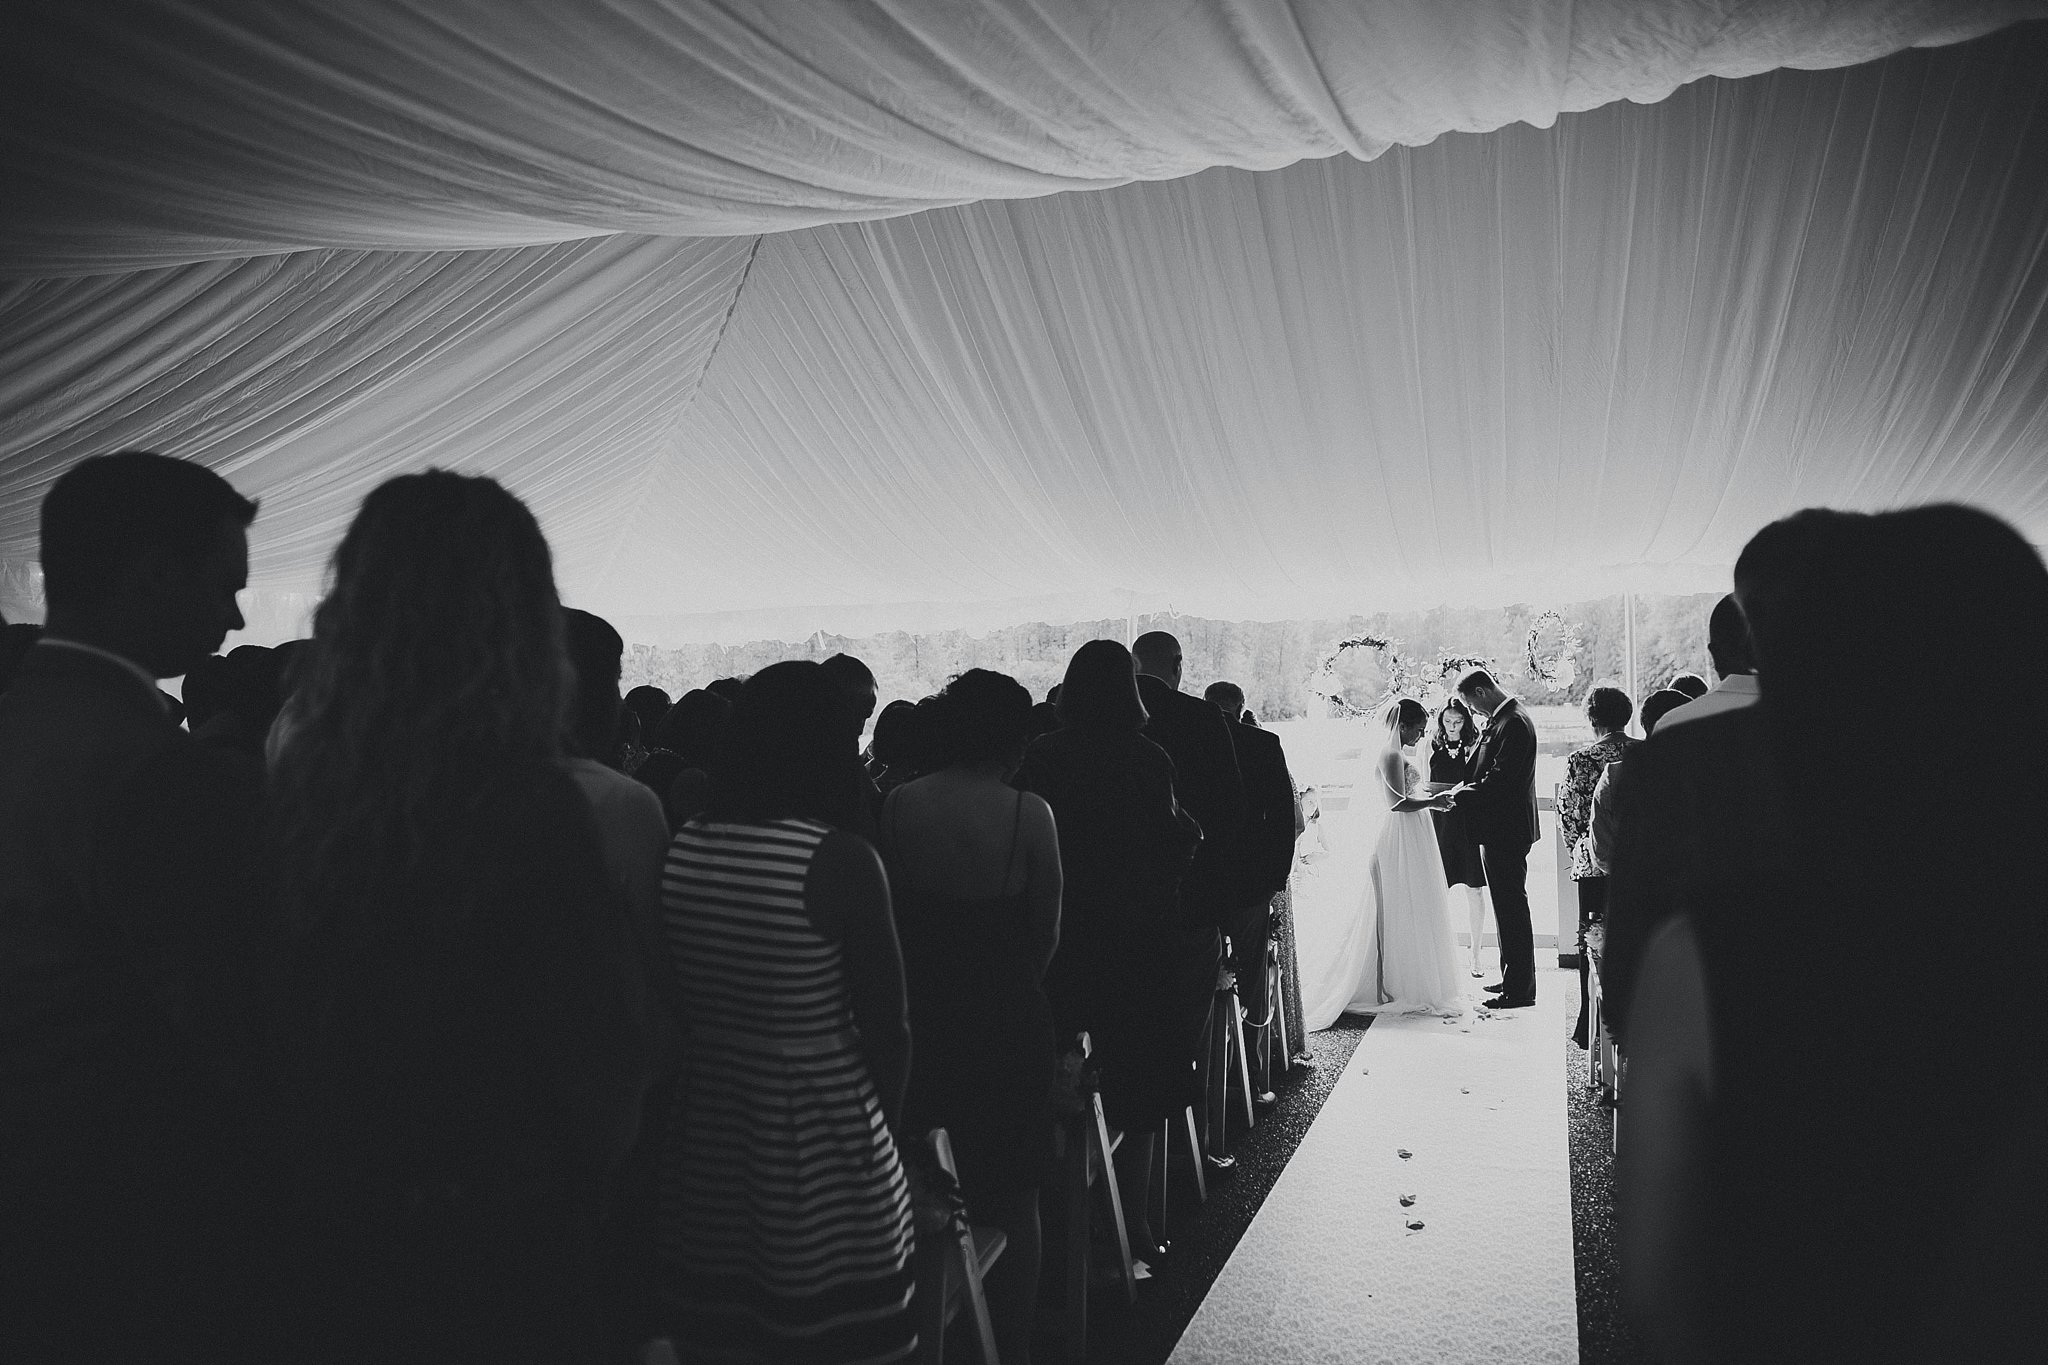 ashley_vos_seattle_wedding_photographer_0097.jpg